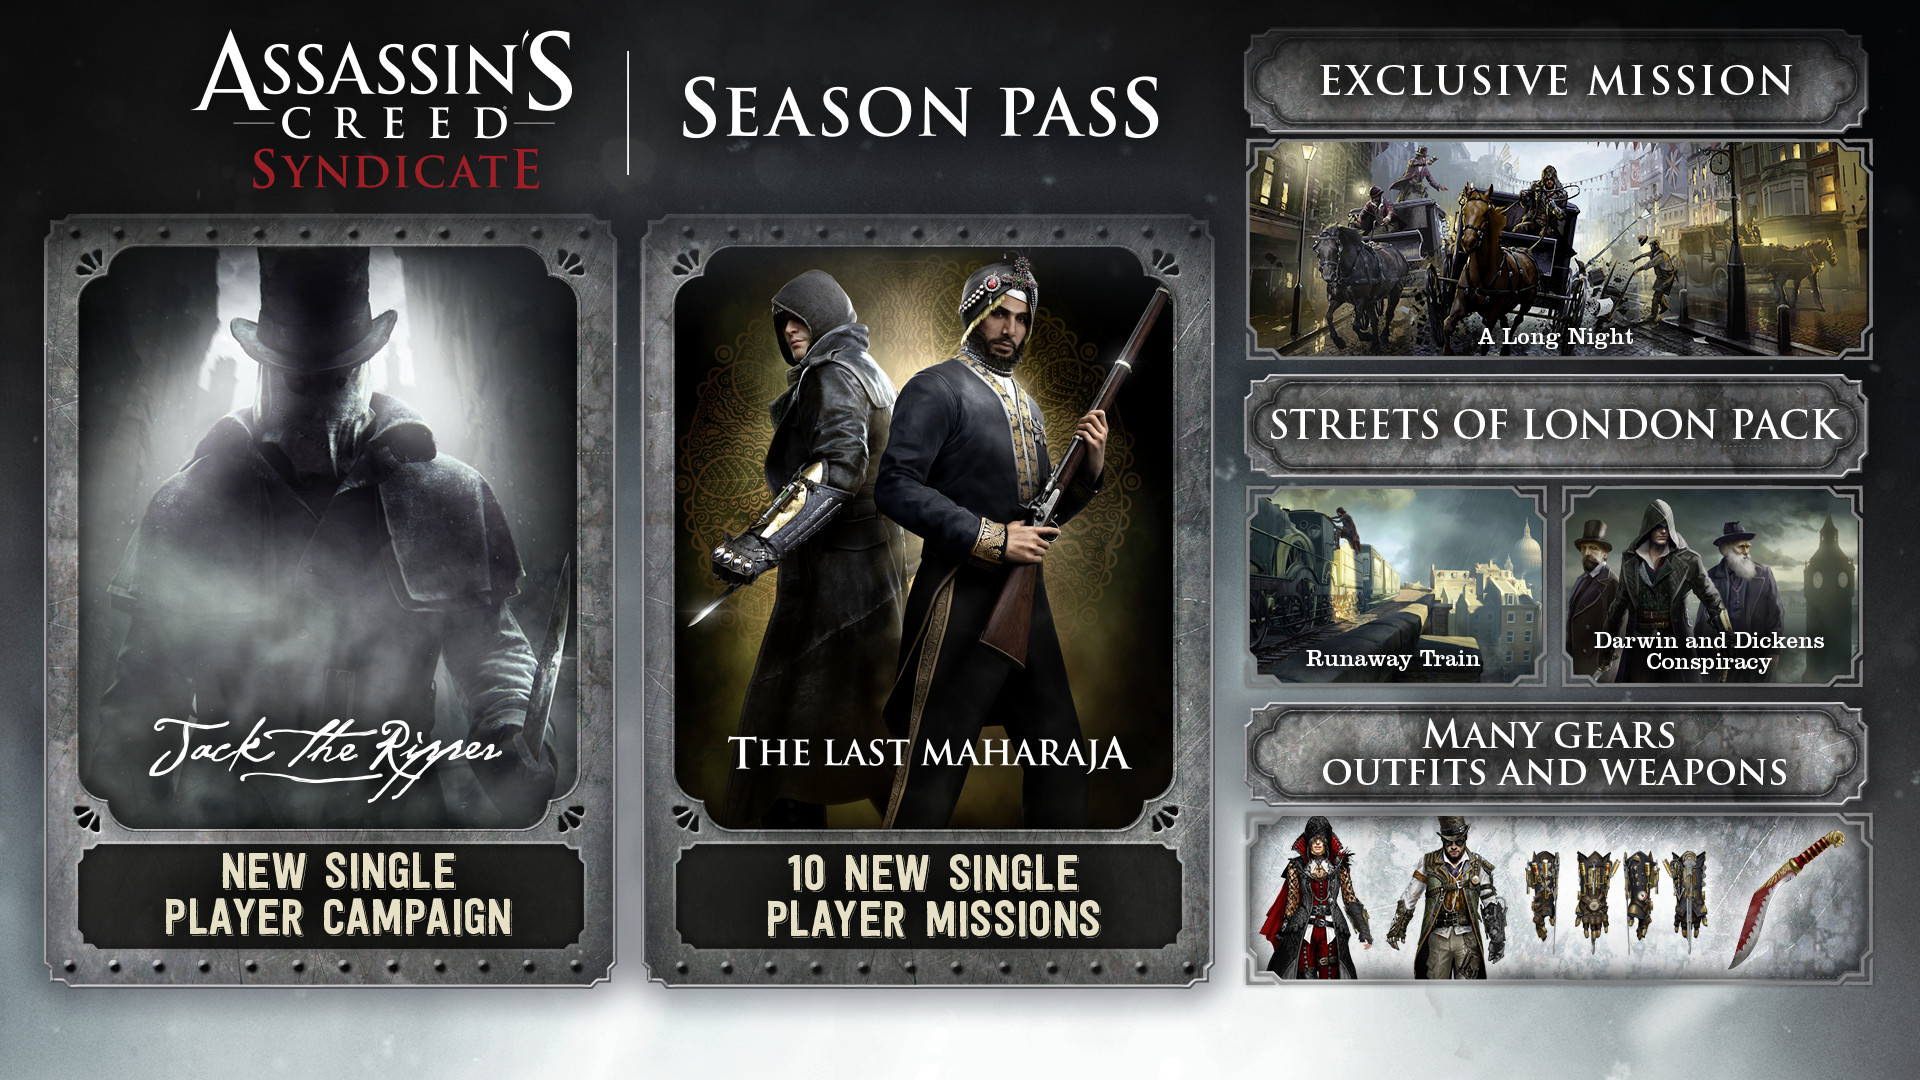 KHAiHOM.com - Assassin's Creed Syndicate Season Pass